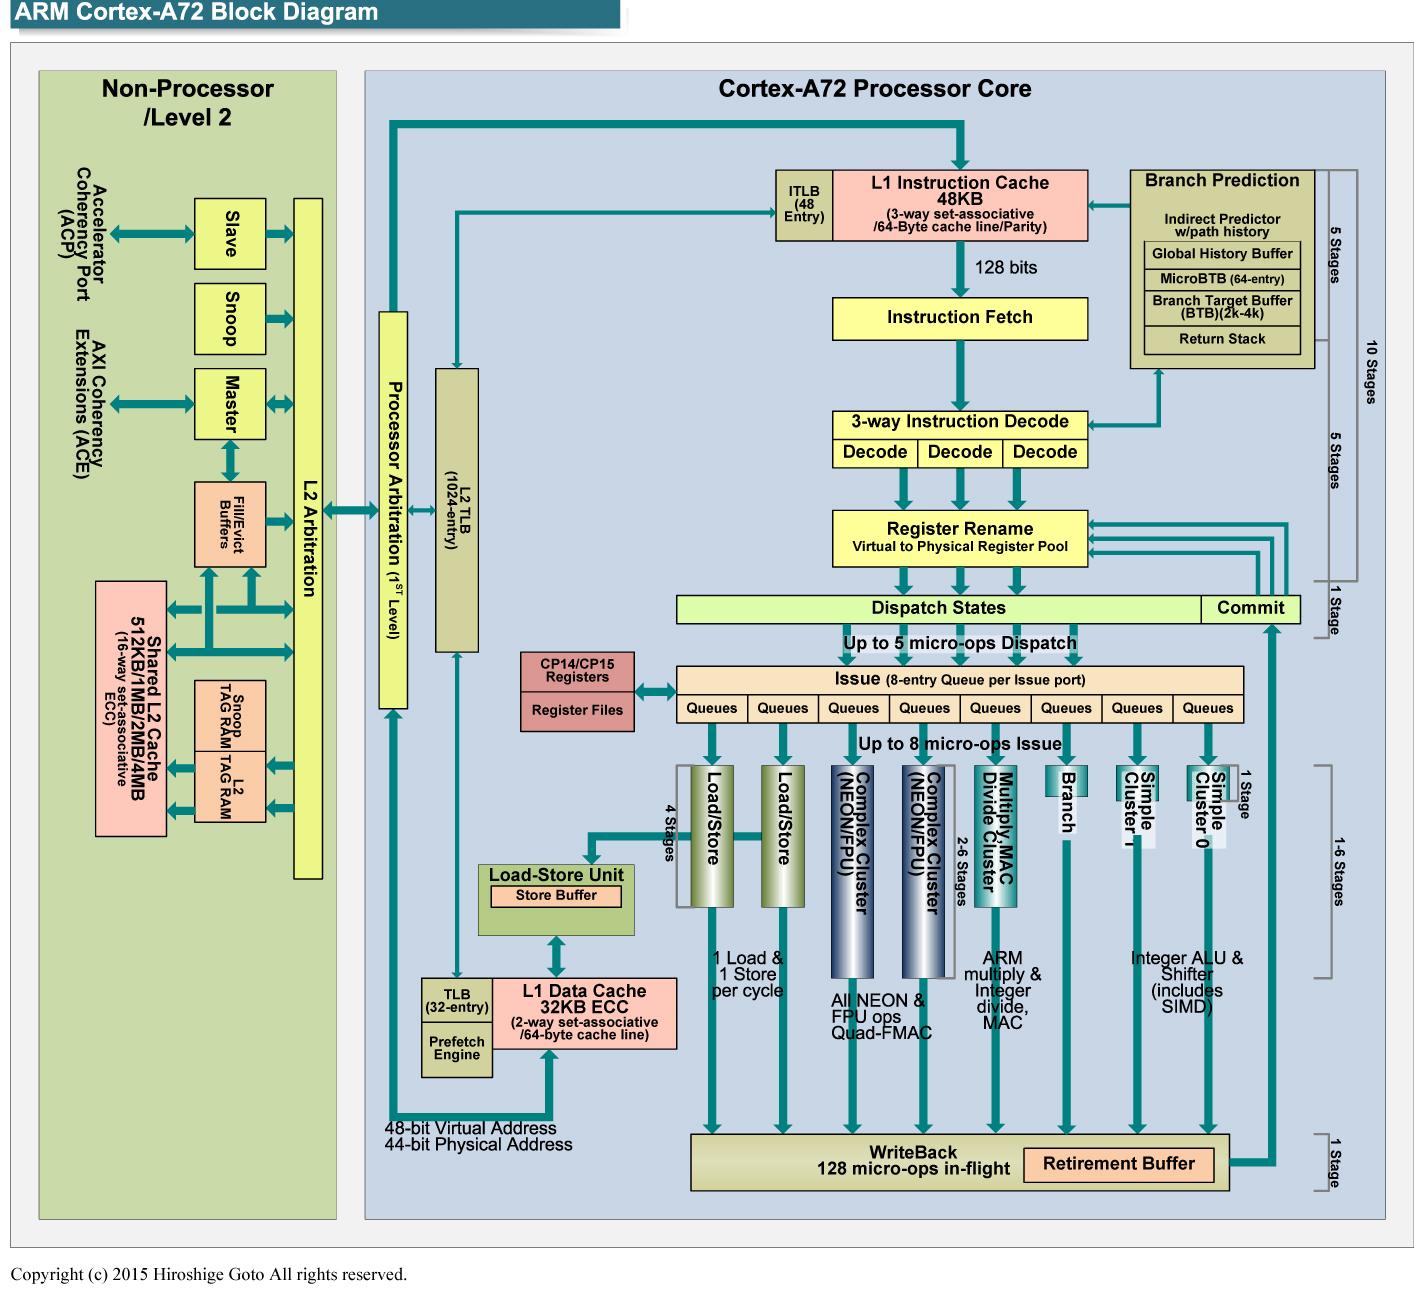 "Cortex-A72のブロック図<br class="""">PDF版は<span class=""img-inline raw""><a href=""/video/pcw/docs/699/491/p4.pdf"" ipw_status=""1"" ipw_linktype=""filelink_raw"" class=""resource"">こちら</a></span>"